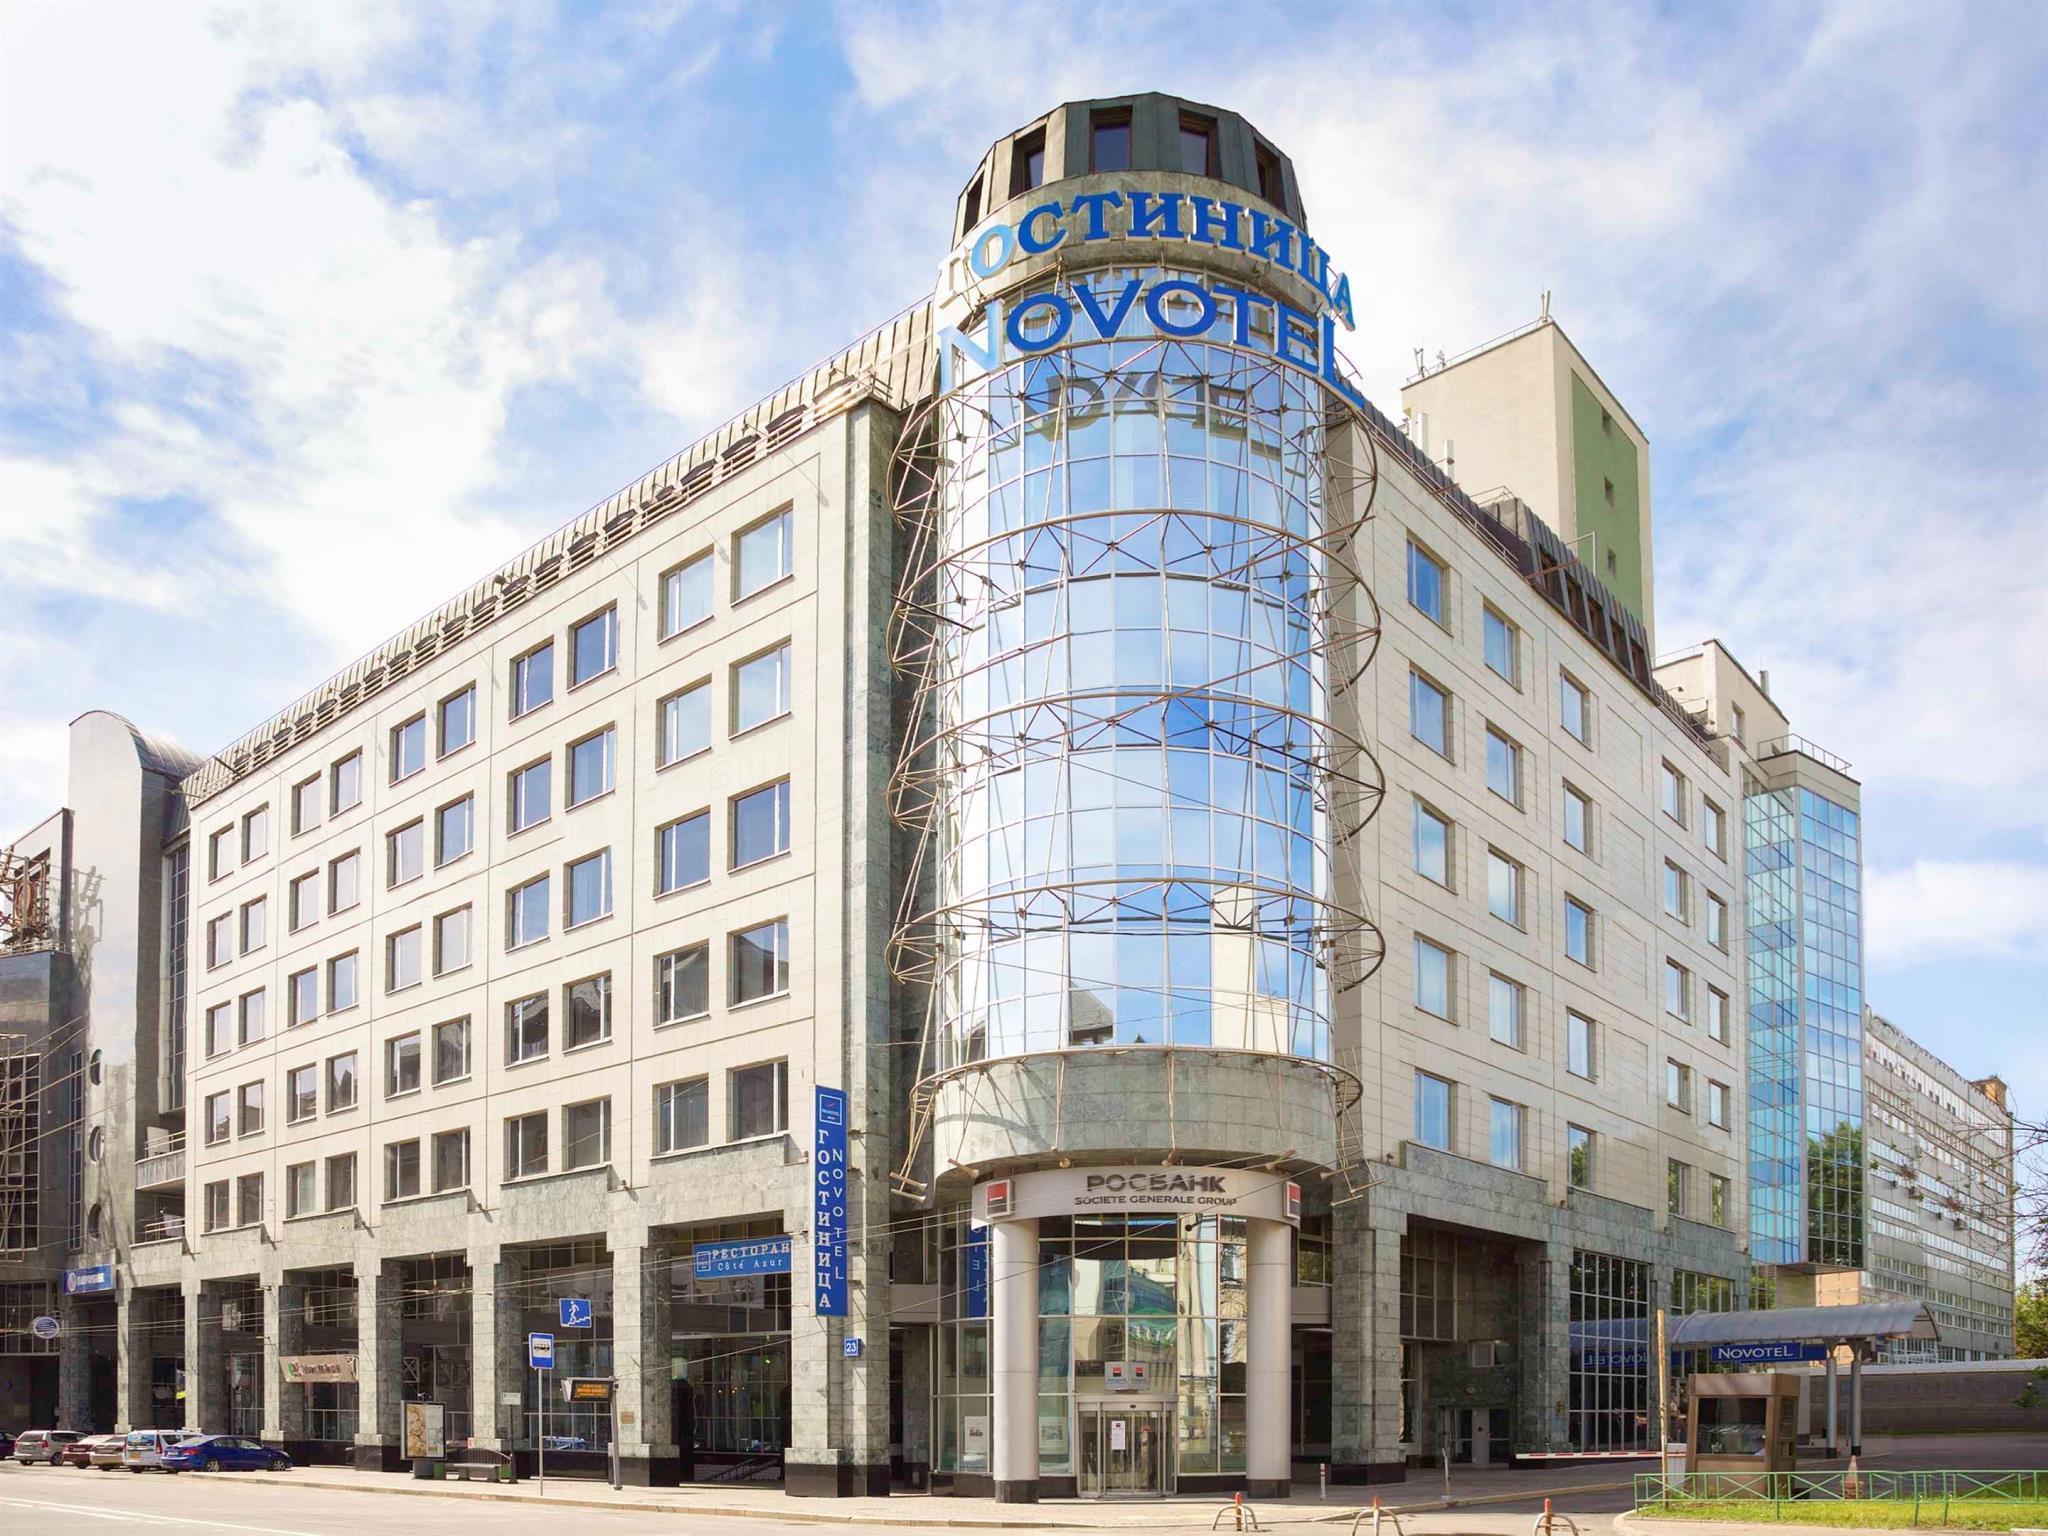 Novotel Moscow Centre Hotel